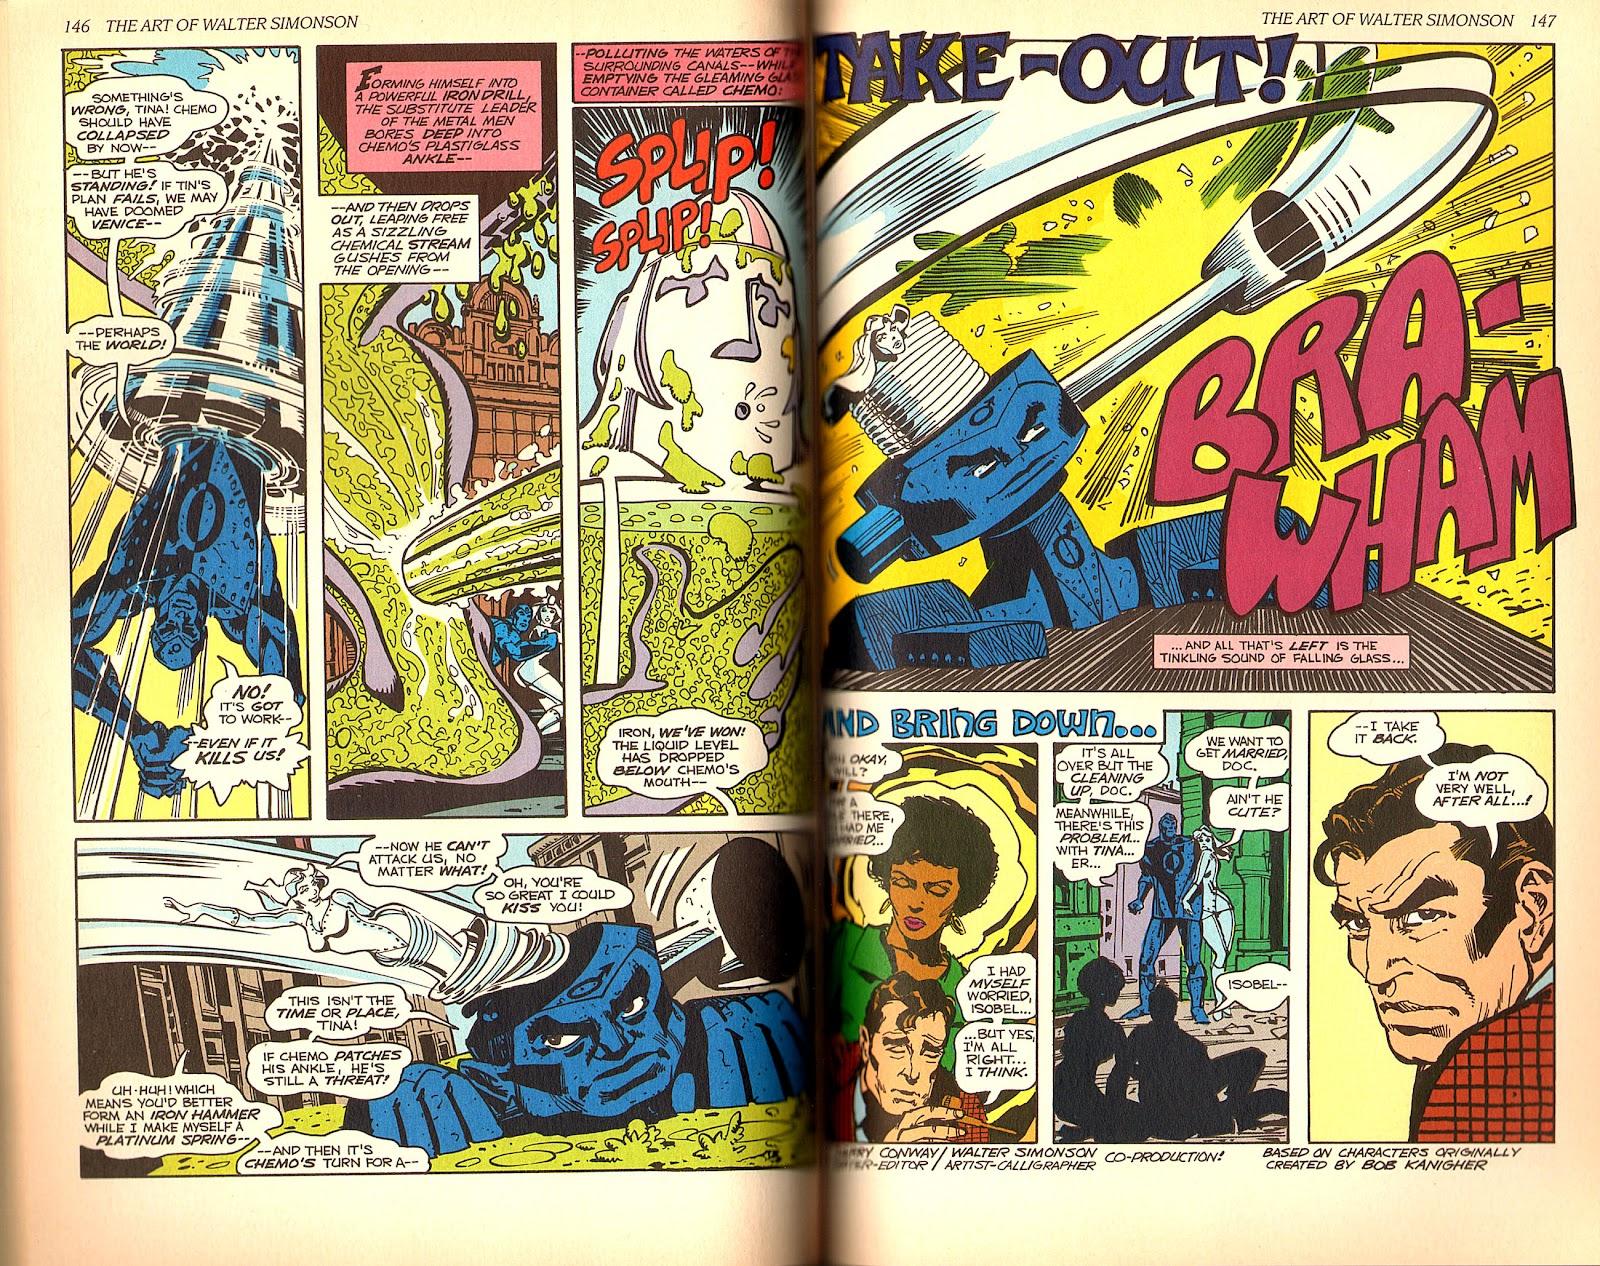 Read online The Art of Walter Simonson comic -  Issue # TPB - 75